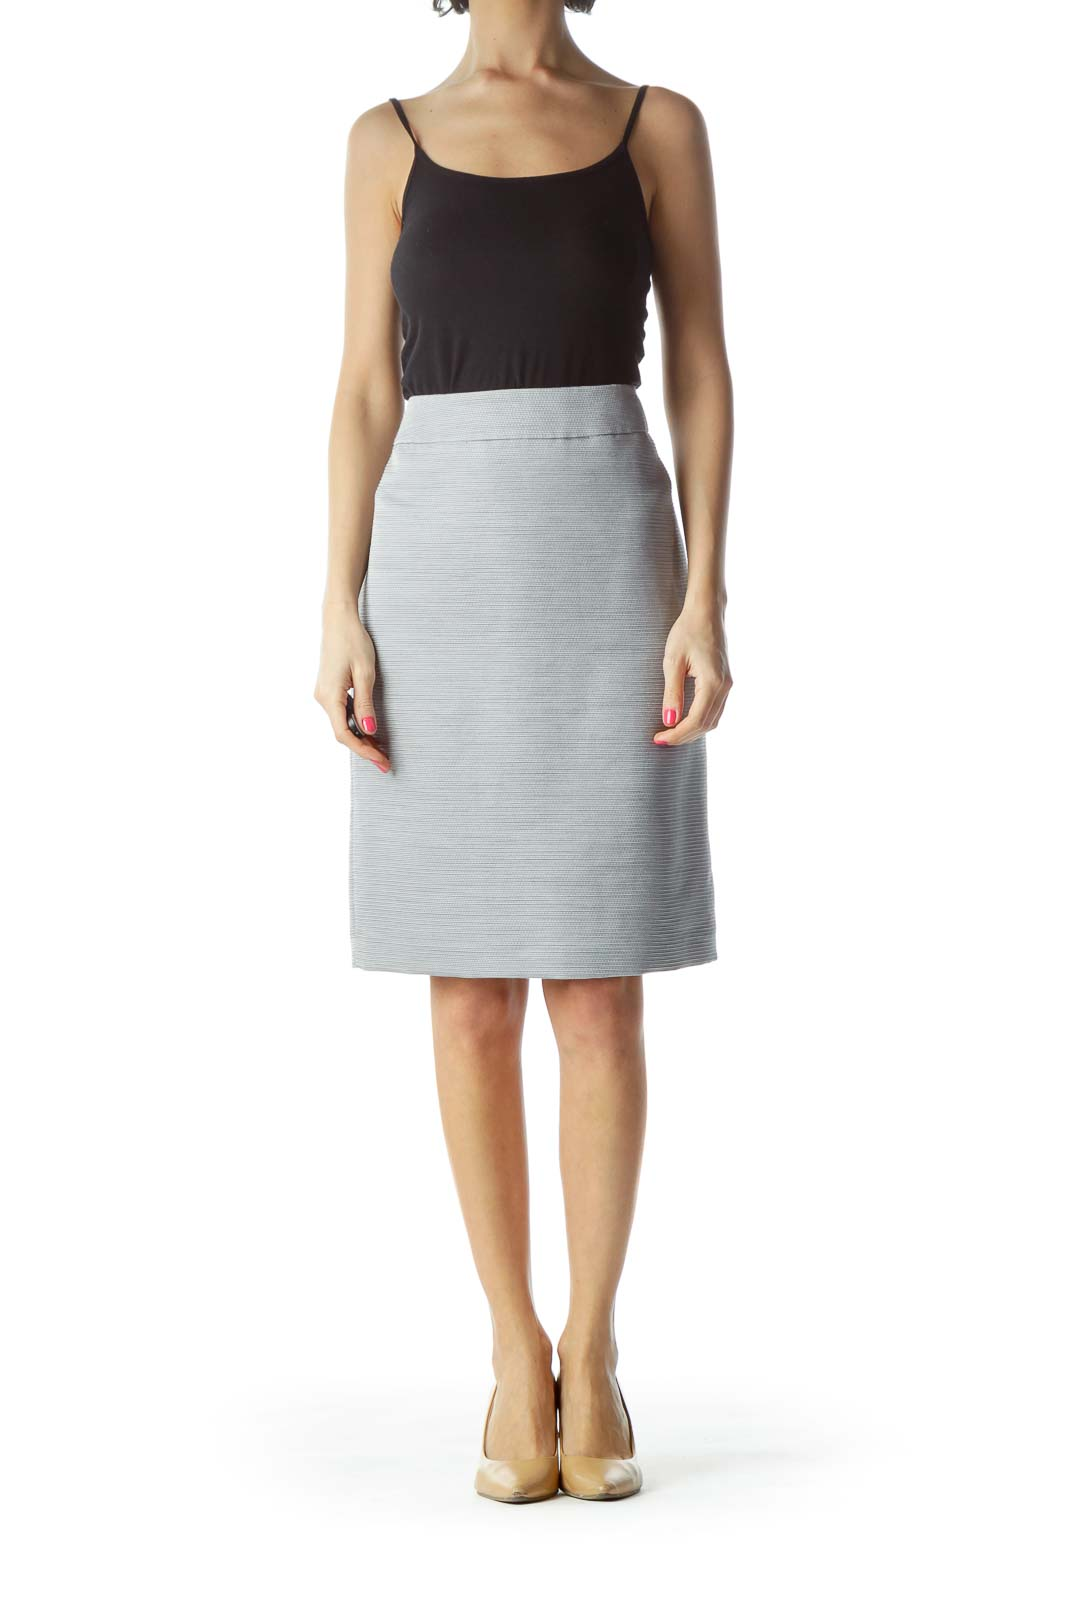 Silver Textured Pencil Skirt